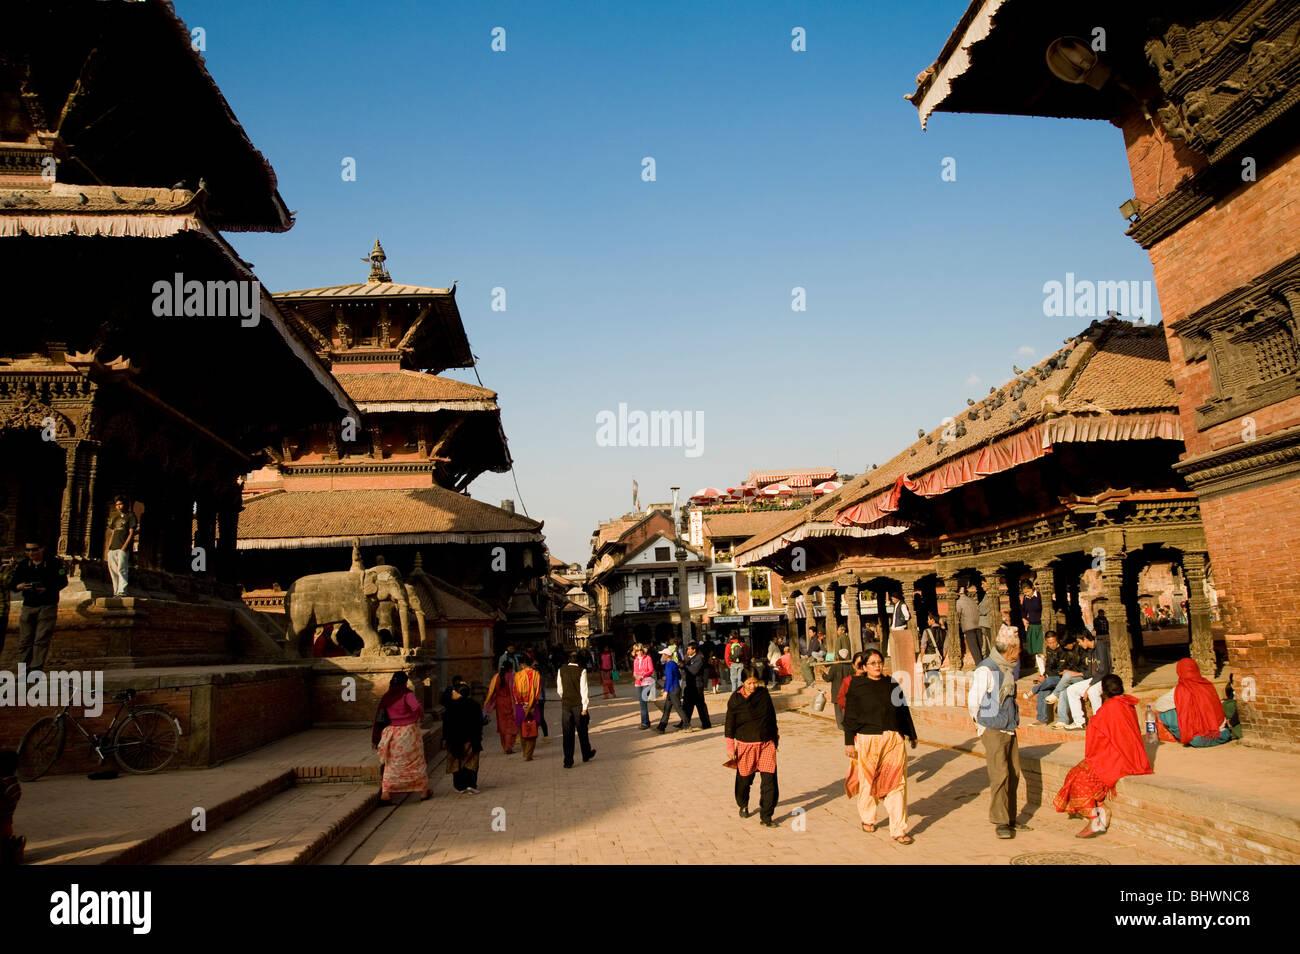 , Patan Durbar Square, Kathmandu, Nepal Imagen De Stock